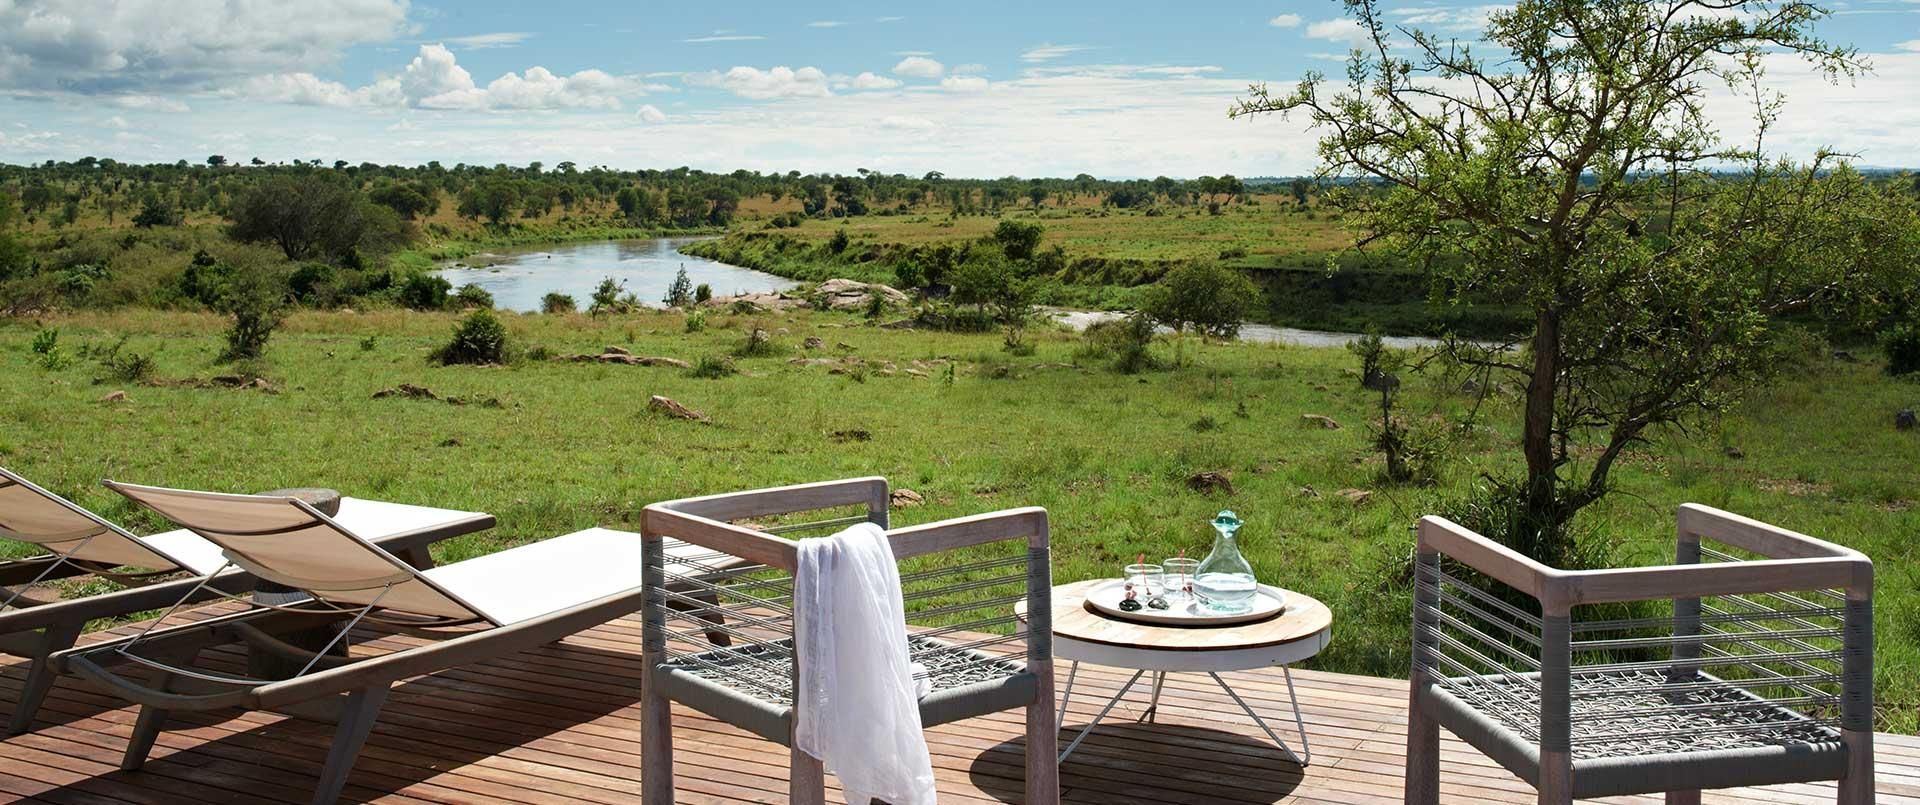 Singita Mara River Camp, Serengeti